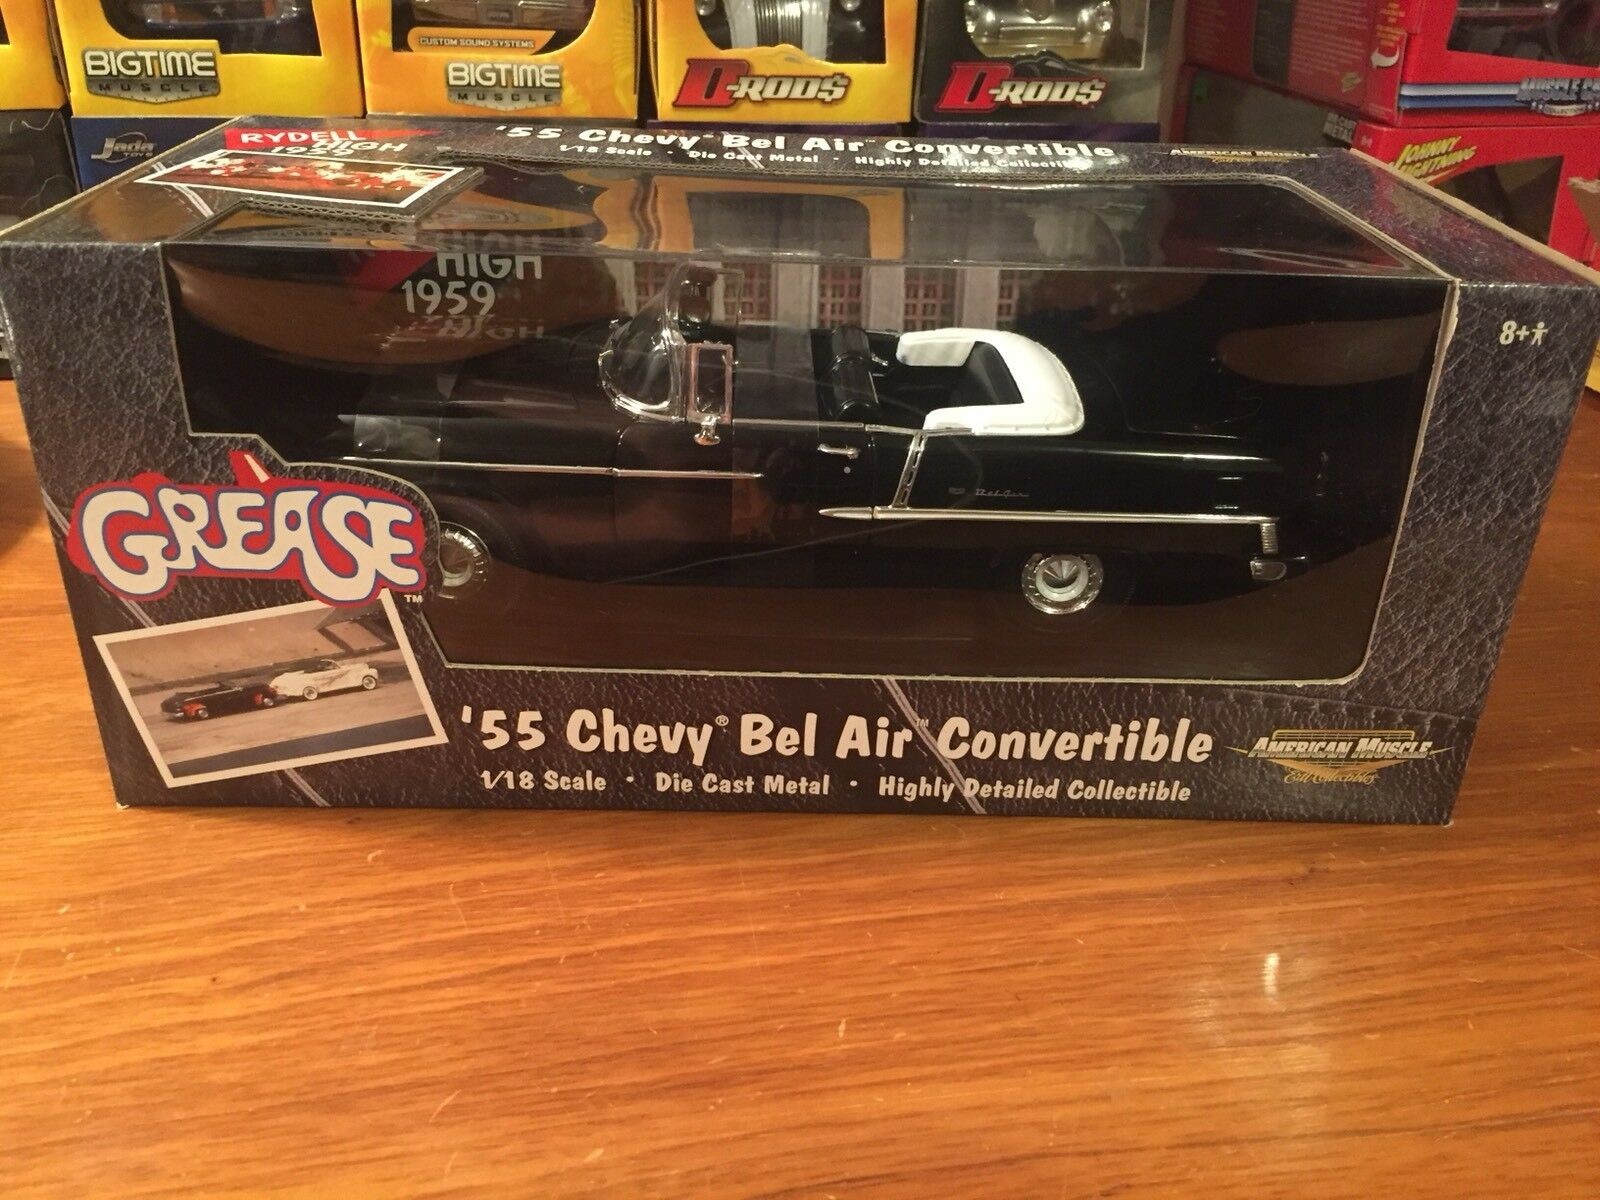 Ertl 1 18 Grease 1955 Chevrolet Bel Air Congreenible Item 36602